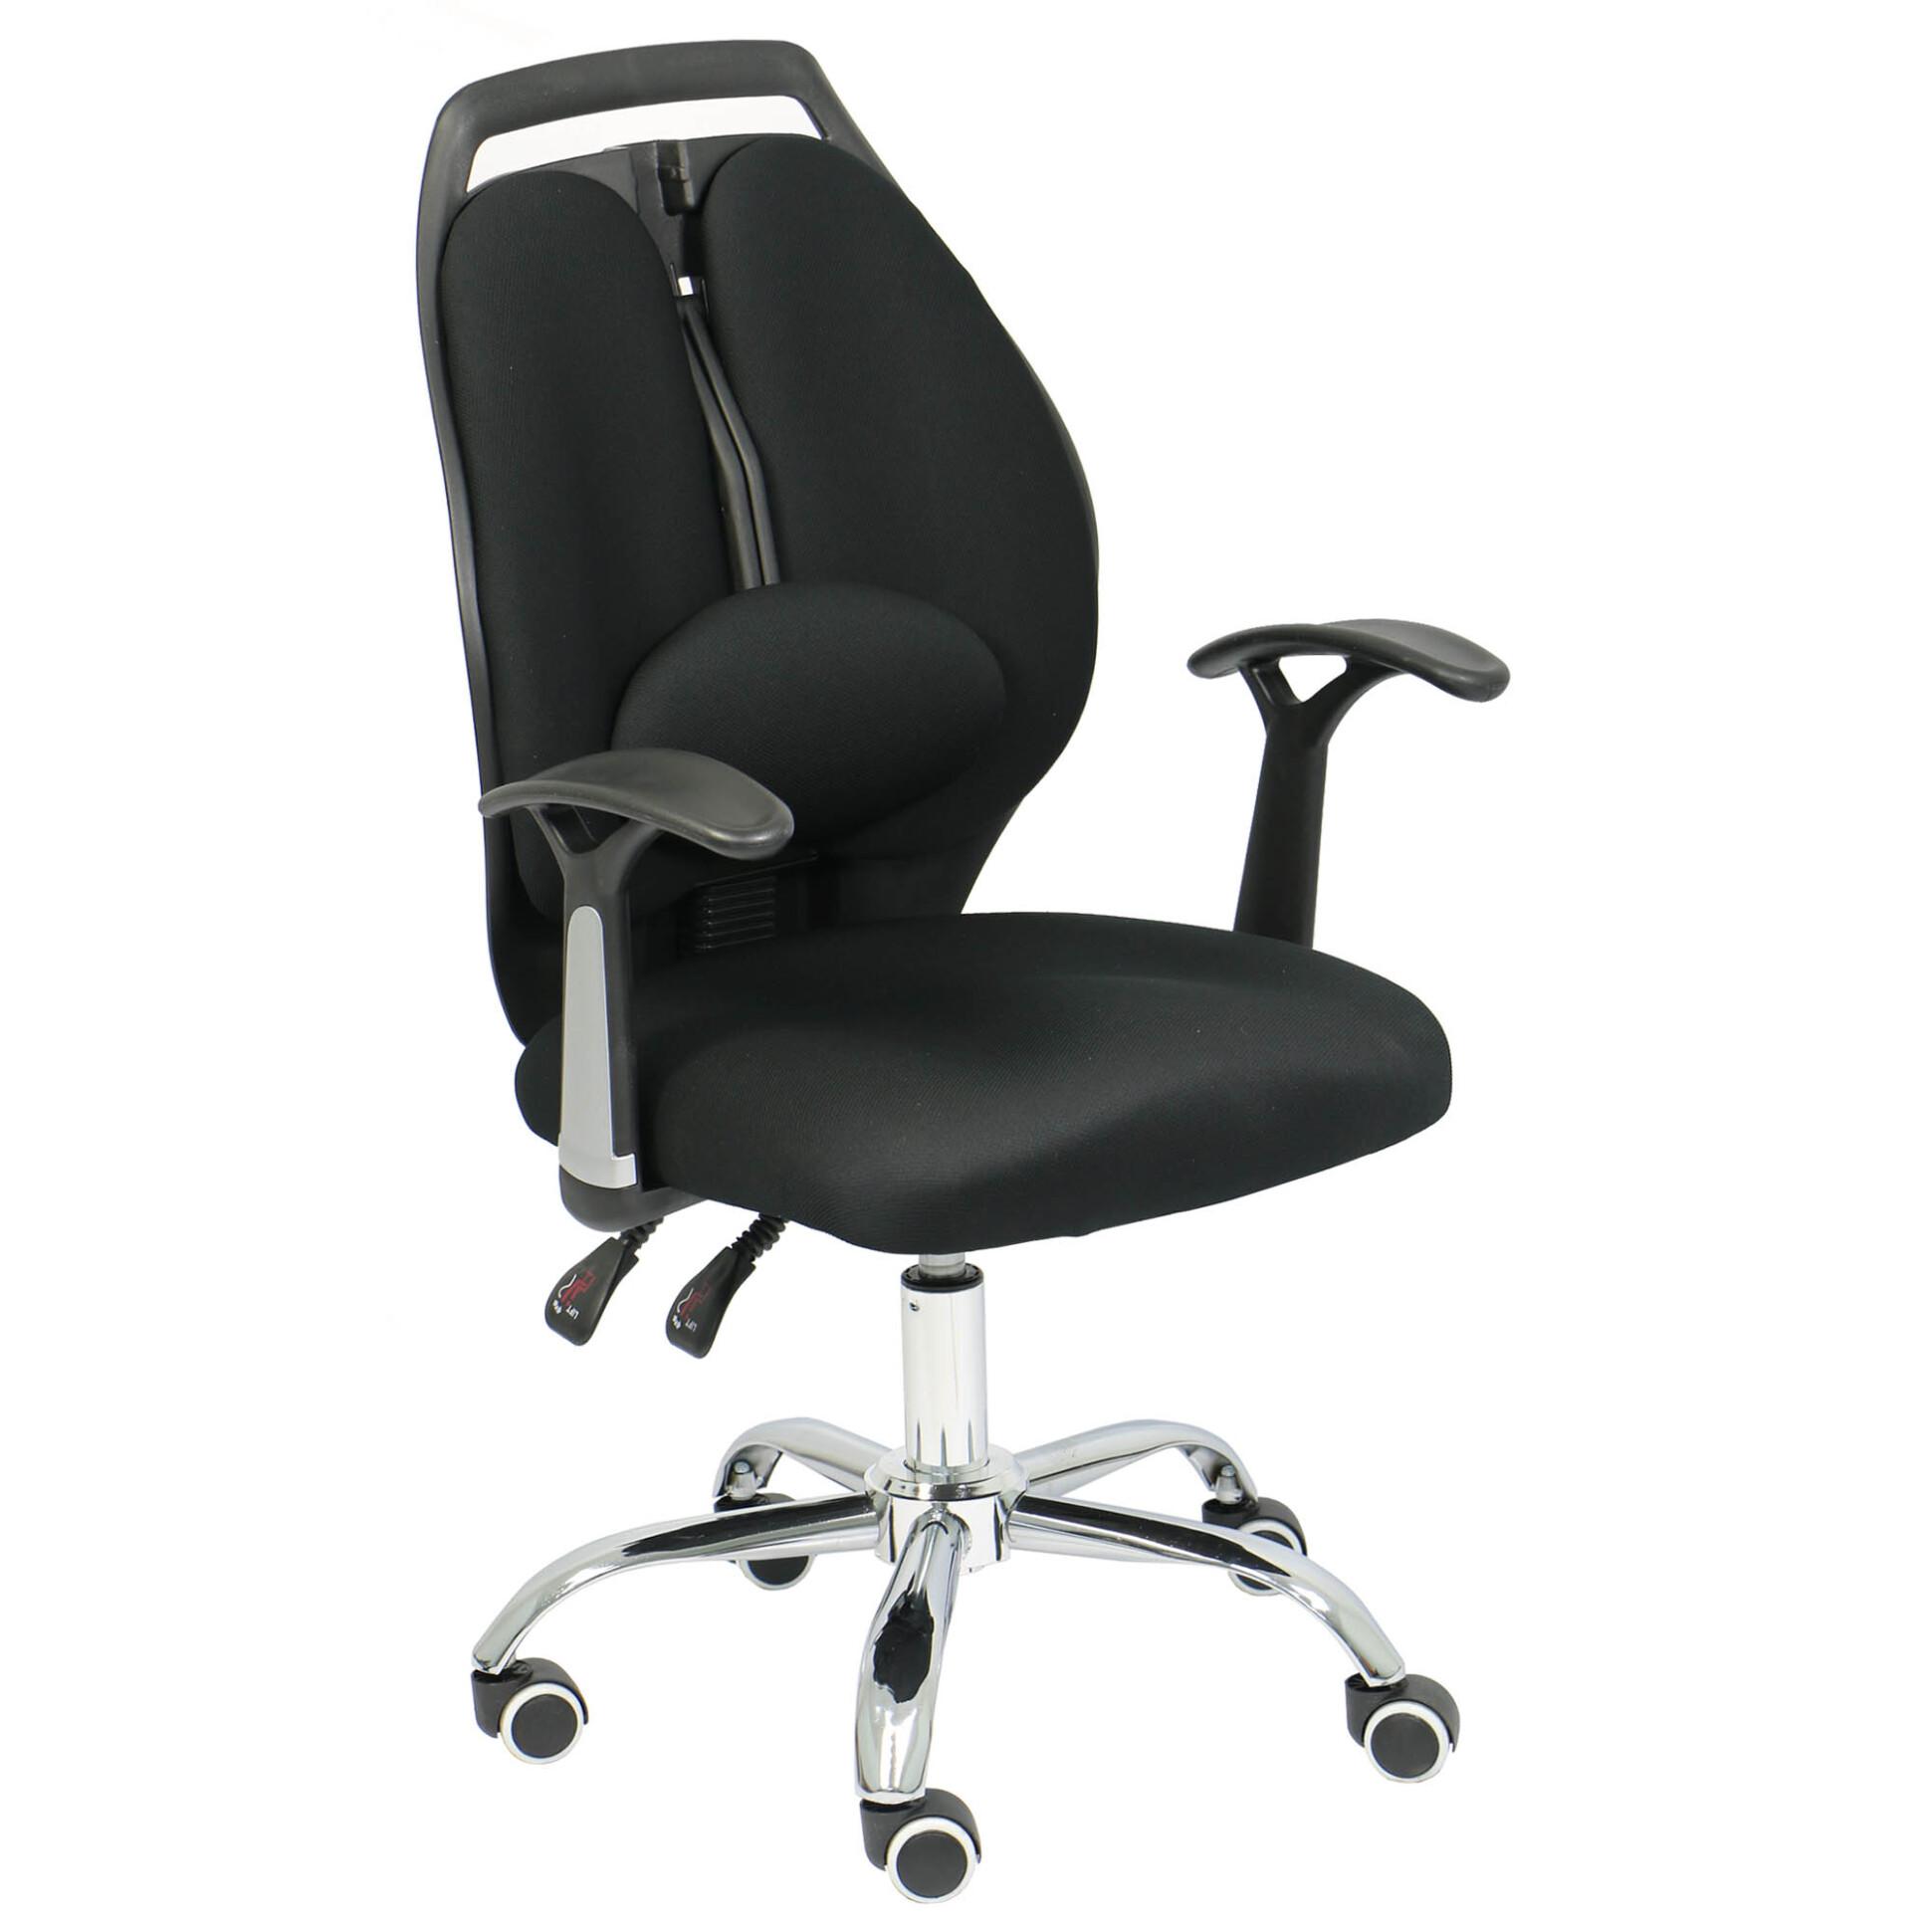 Strelley Executive Chair Black Furniture & Home Décor